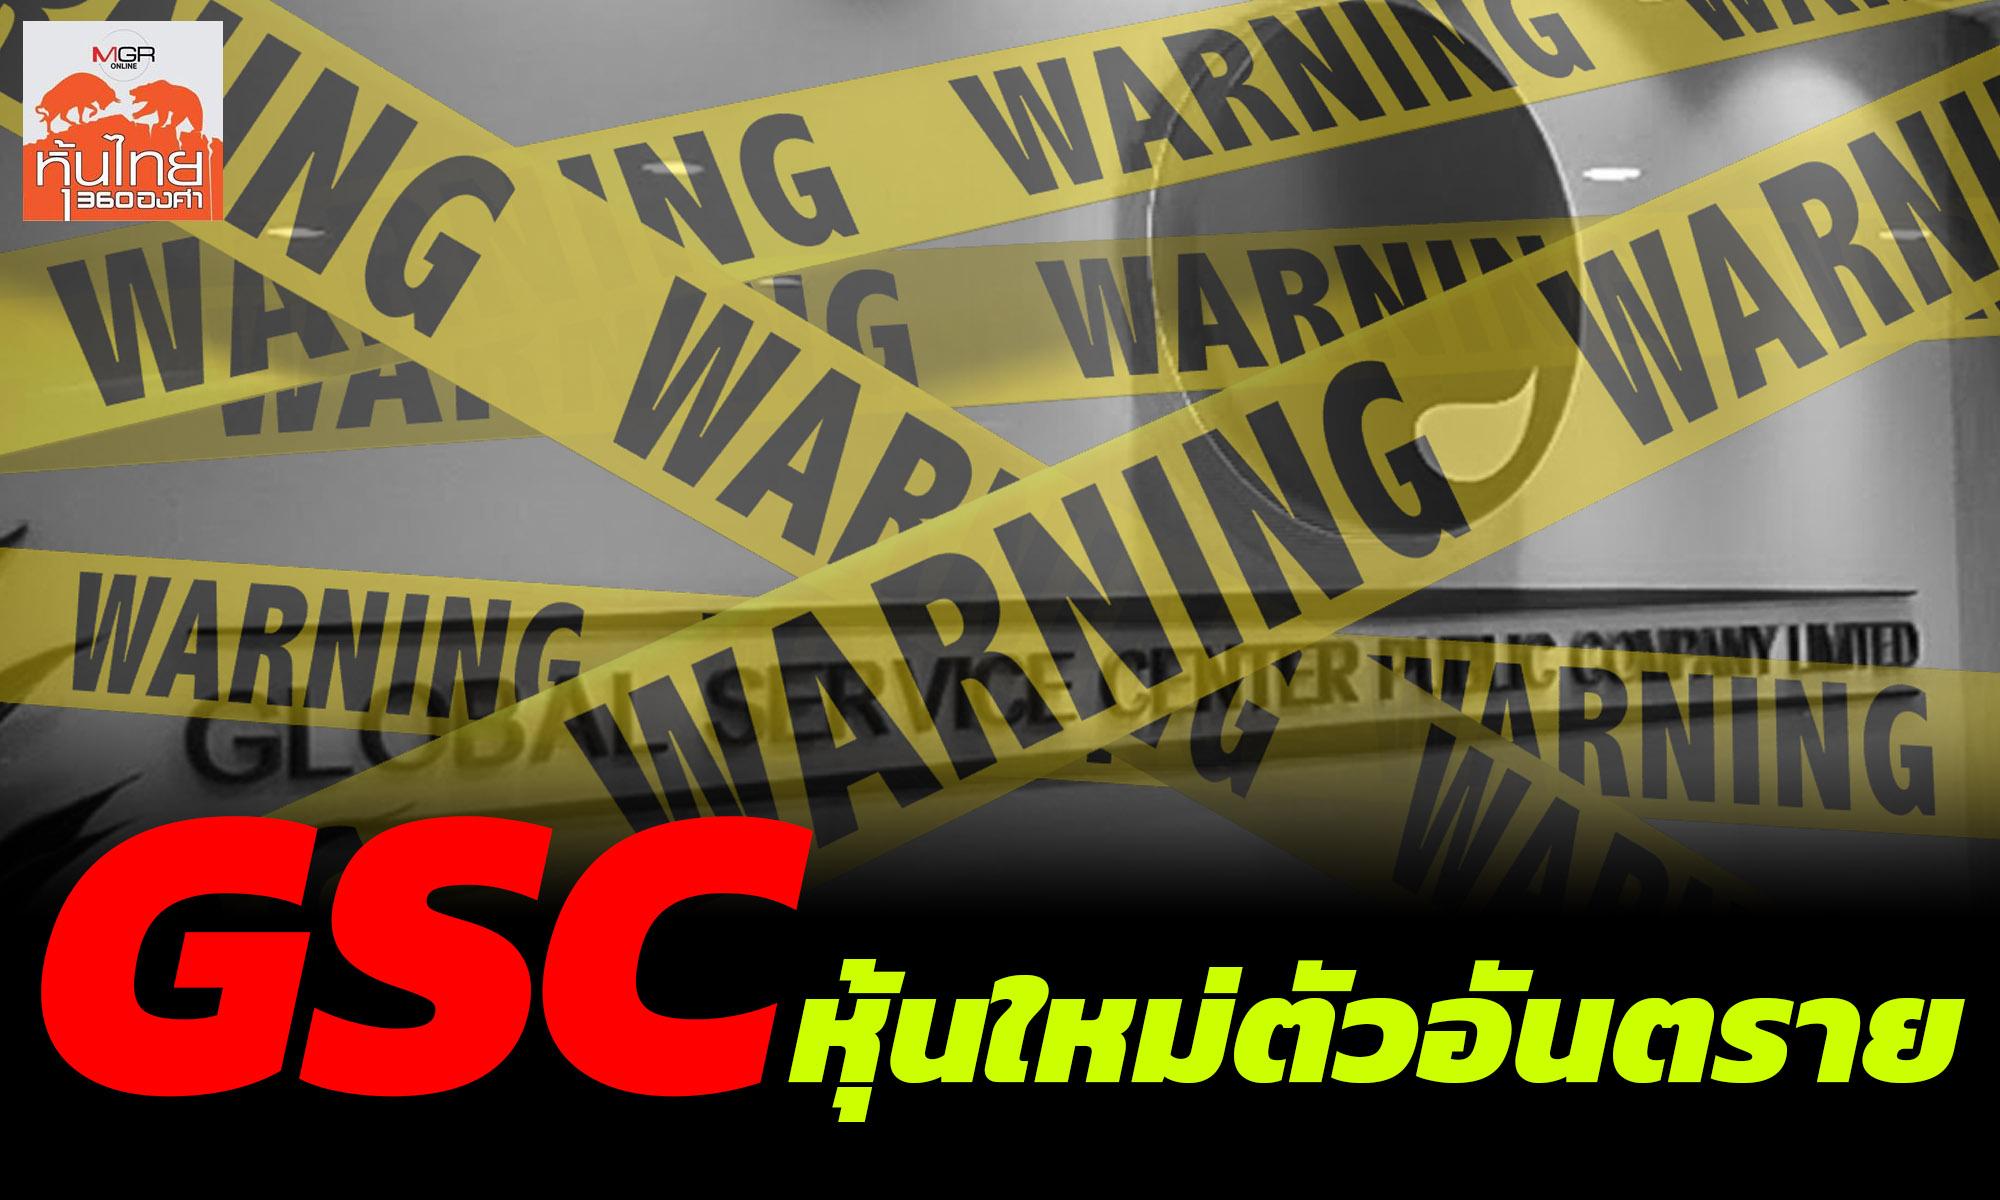 GSC..หุ้นใหม่ตัวอันตราย / สุนันท์ ศรีจันทรา